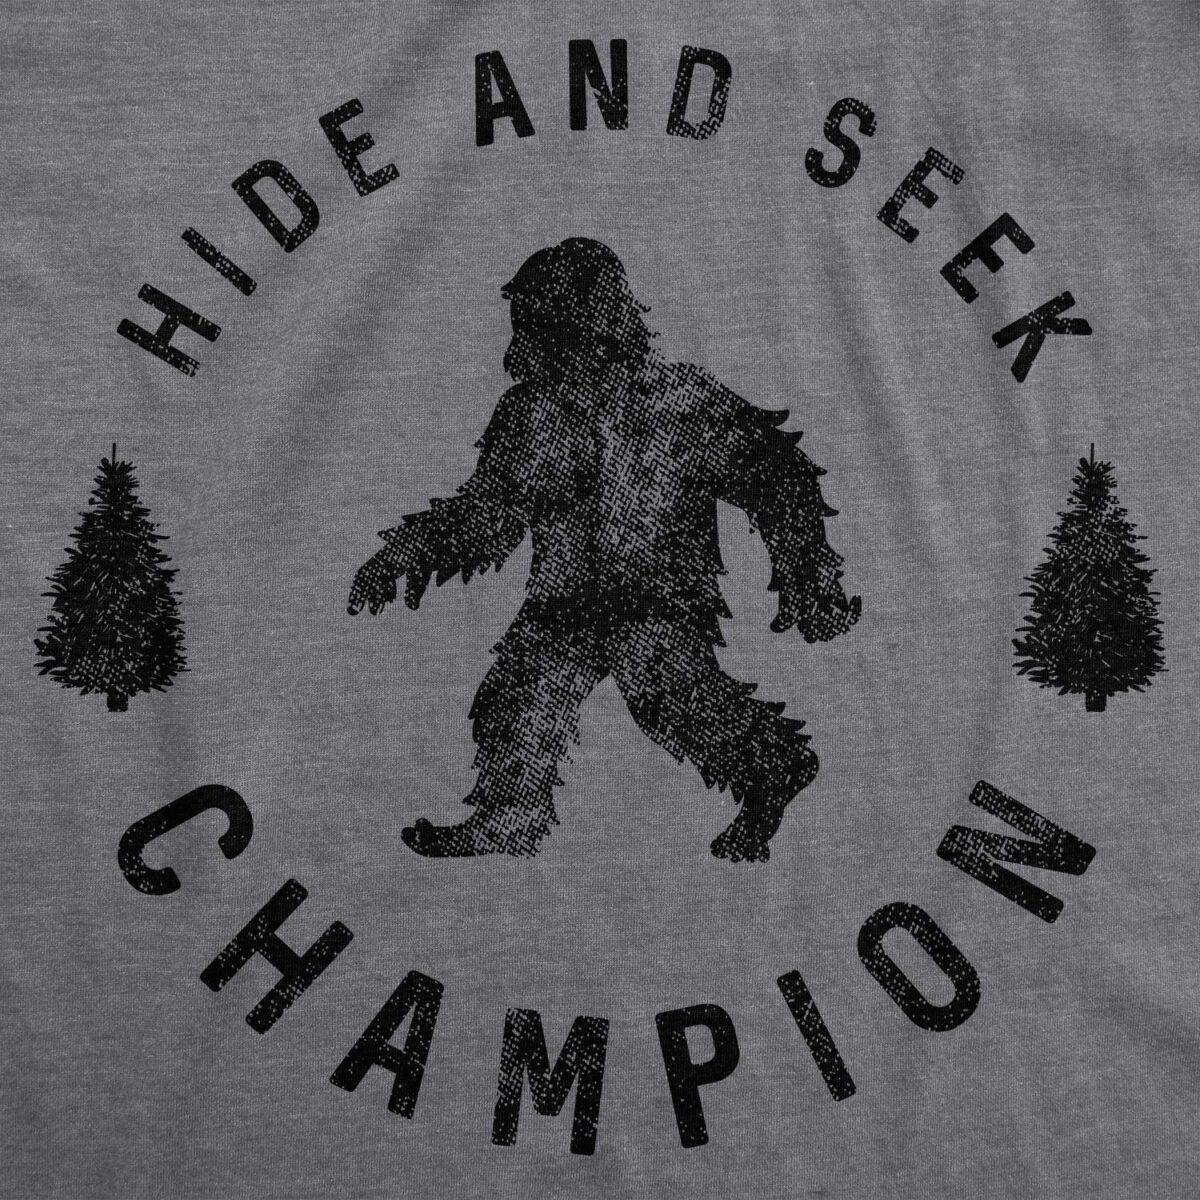 Womens Hide and Seek Champion T Shirt Funny Bigfoot Sasquatch Vintage Graphic